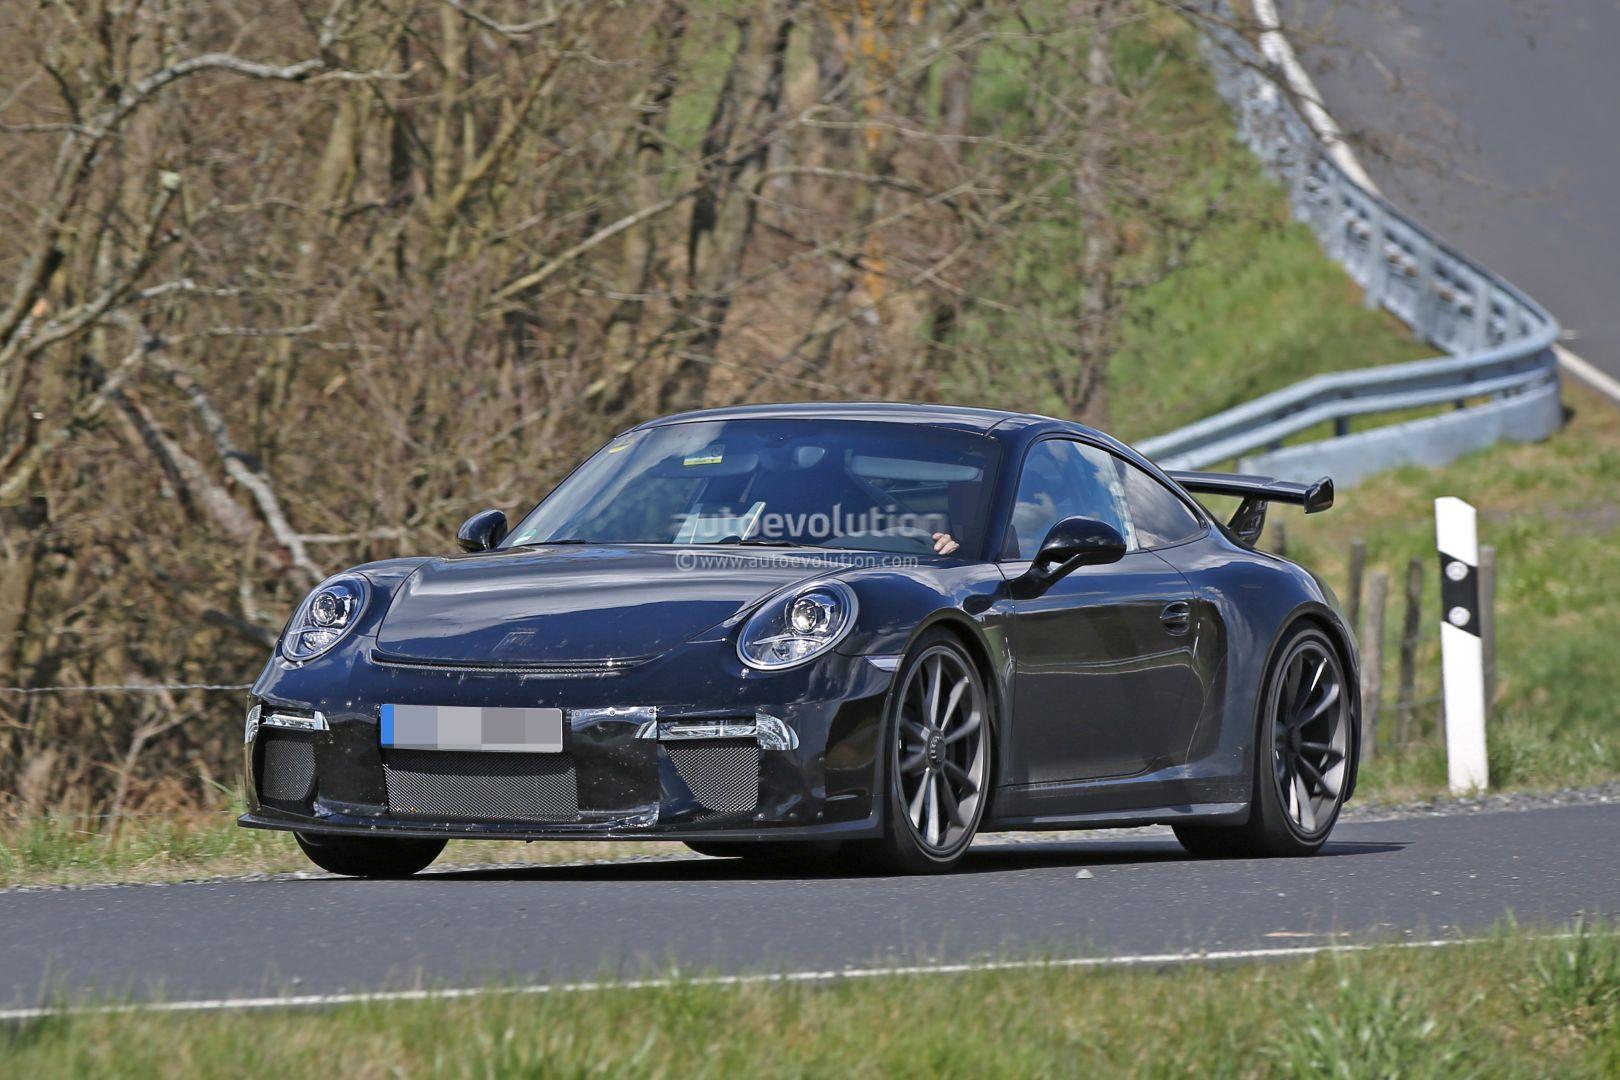 2017 Porsche 911 GT3 Spied on Nurburgring, to Get 911 R 6-Speed Manual ...